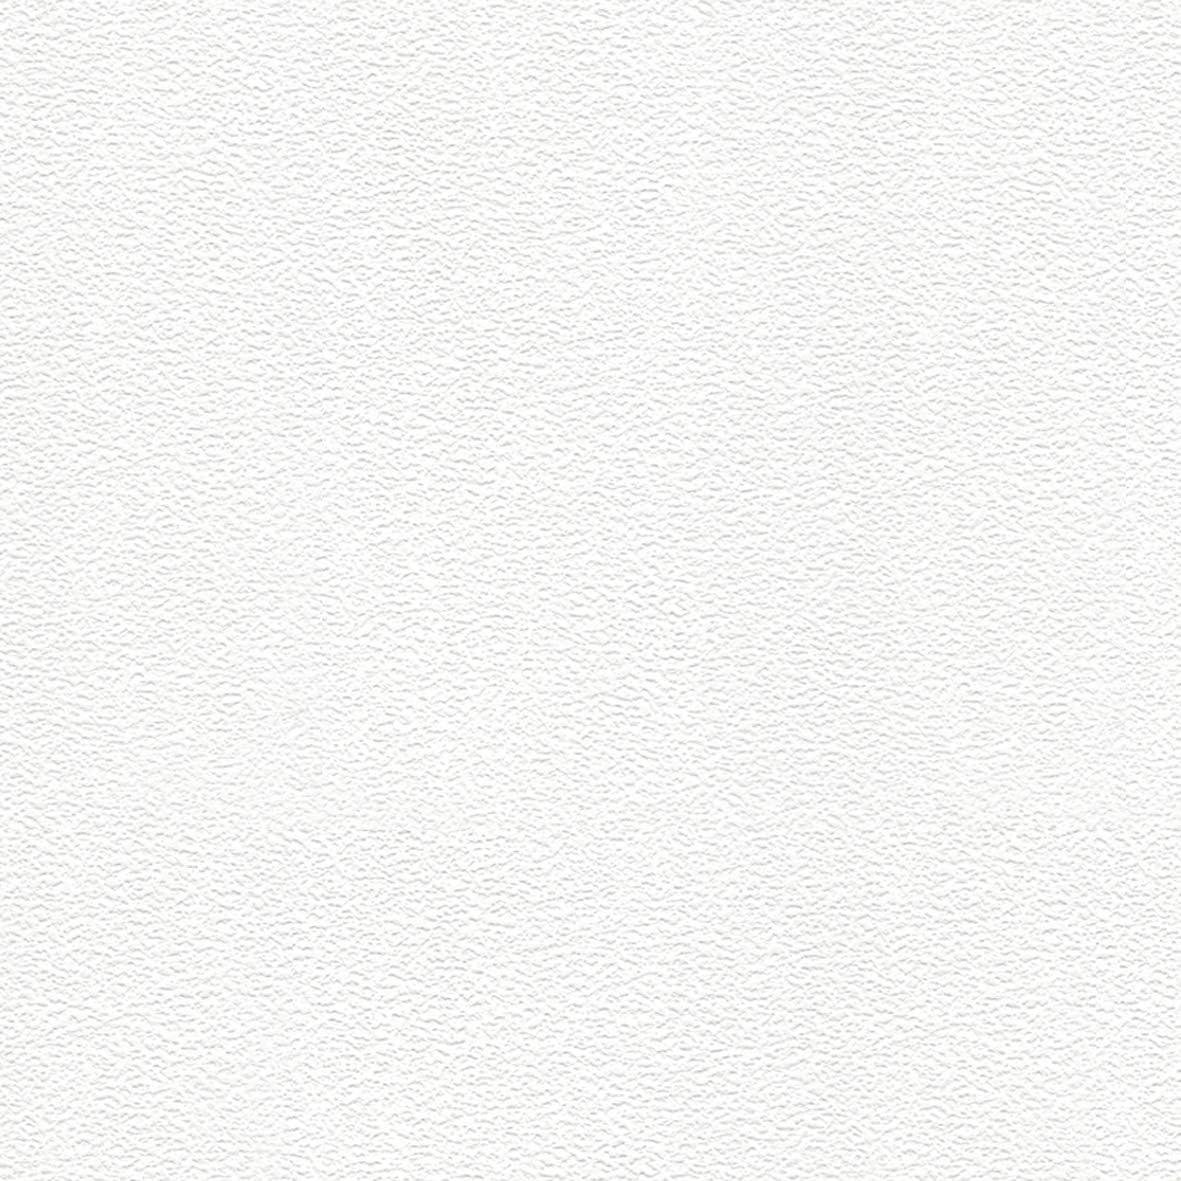 Amazon 菊池襖紙工場 貼ってはがせる壁紙 Jk9028 無地 スノーホワイト 本体 奥行0 1cm 本体 高さ250cm 本体 幅90cm 壁紙